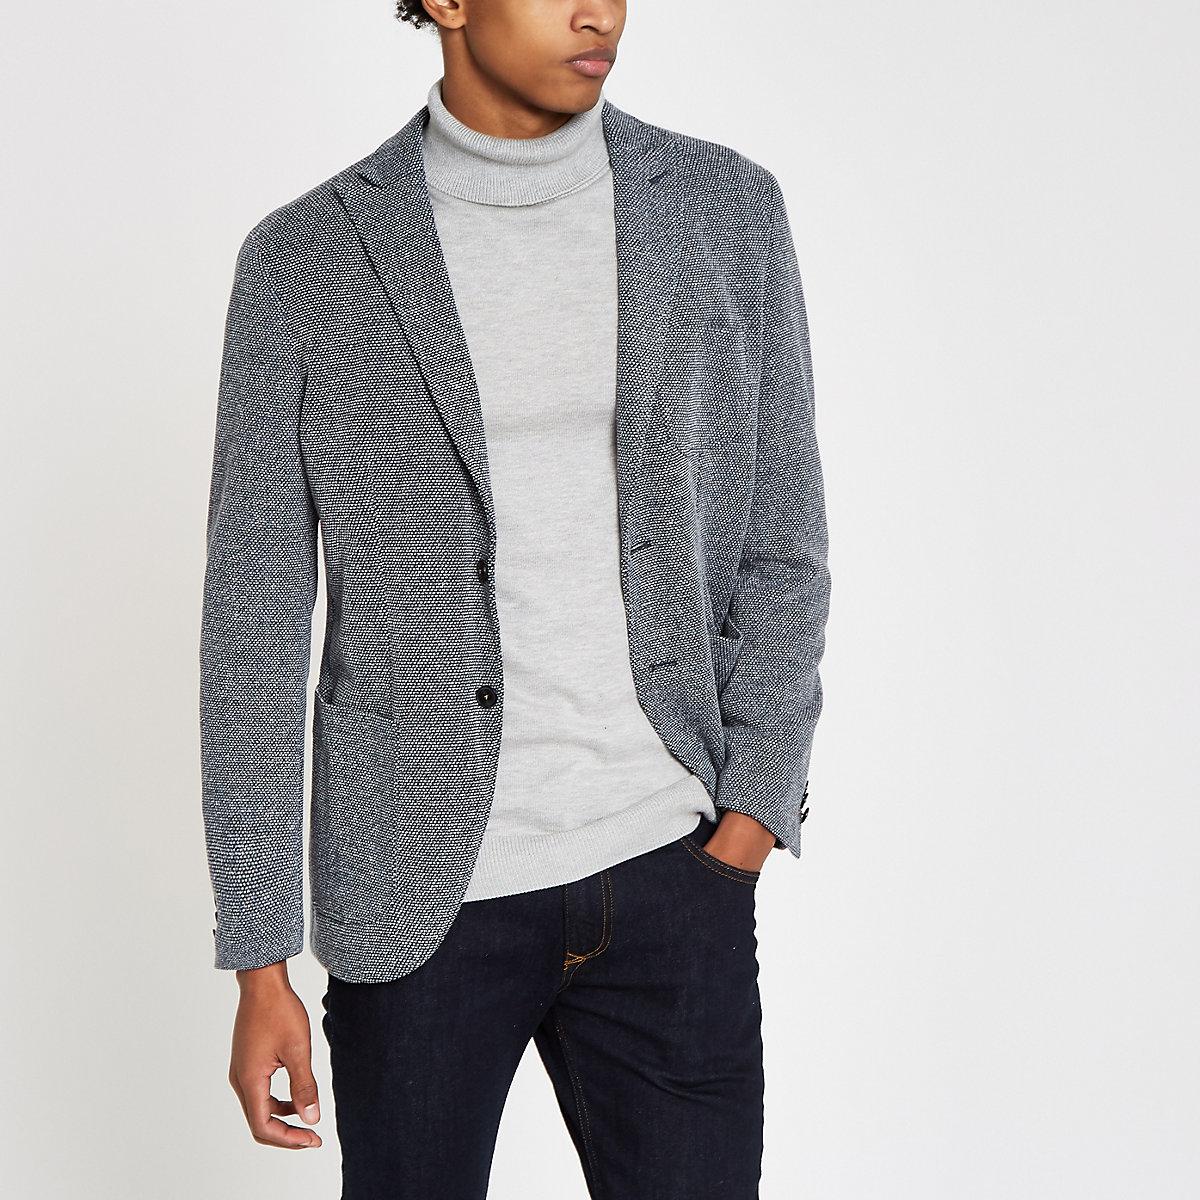 Jack & Jones Premium grey blazer